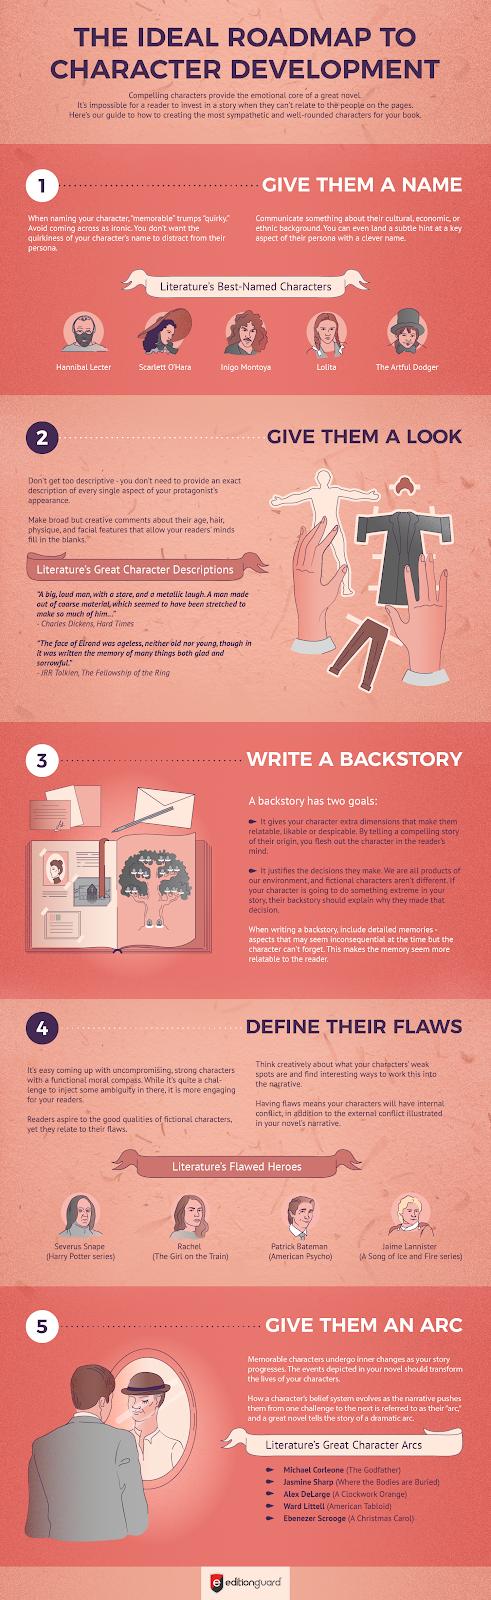 06 editionguard infographic 01